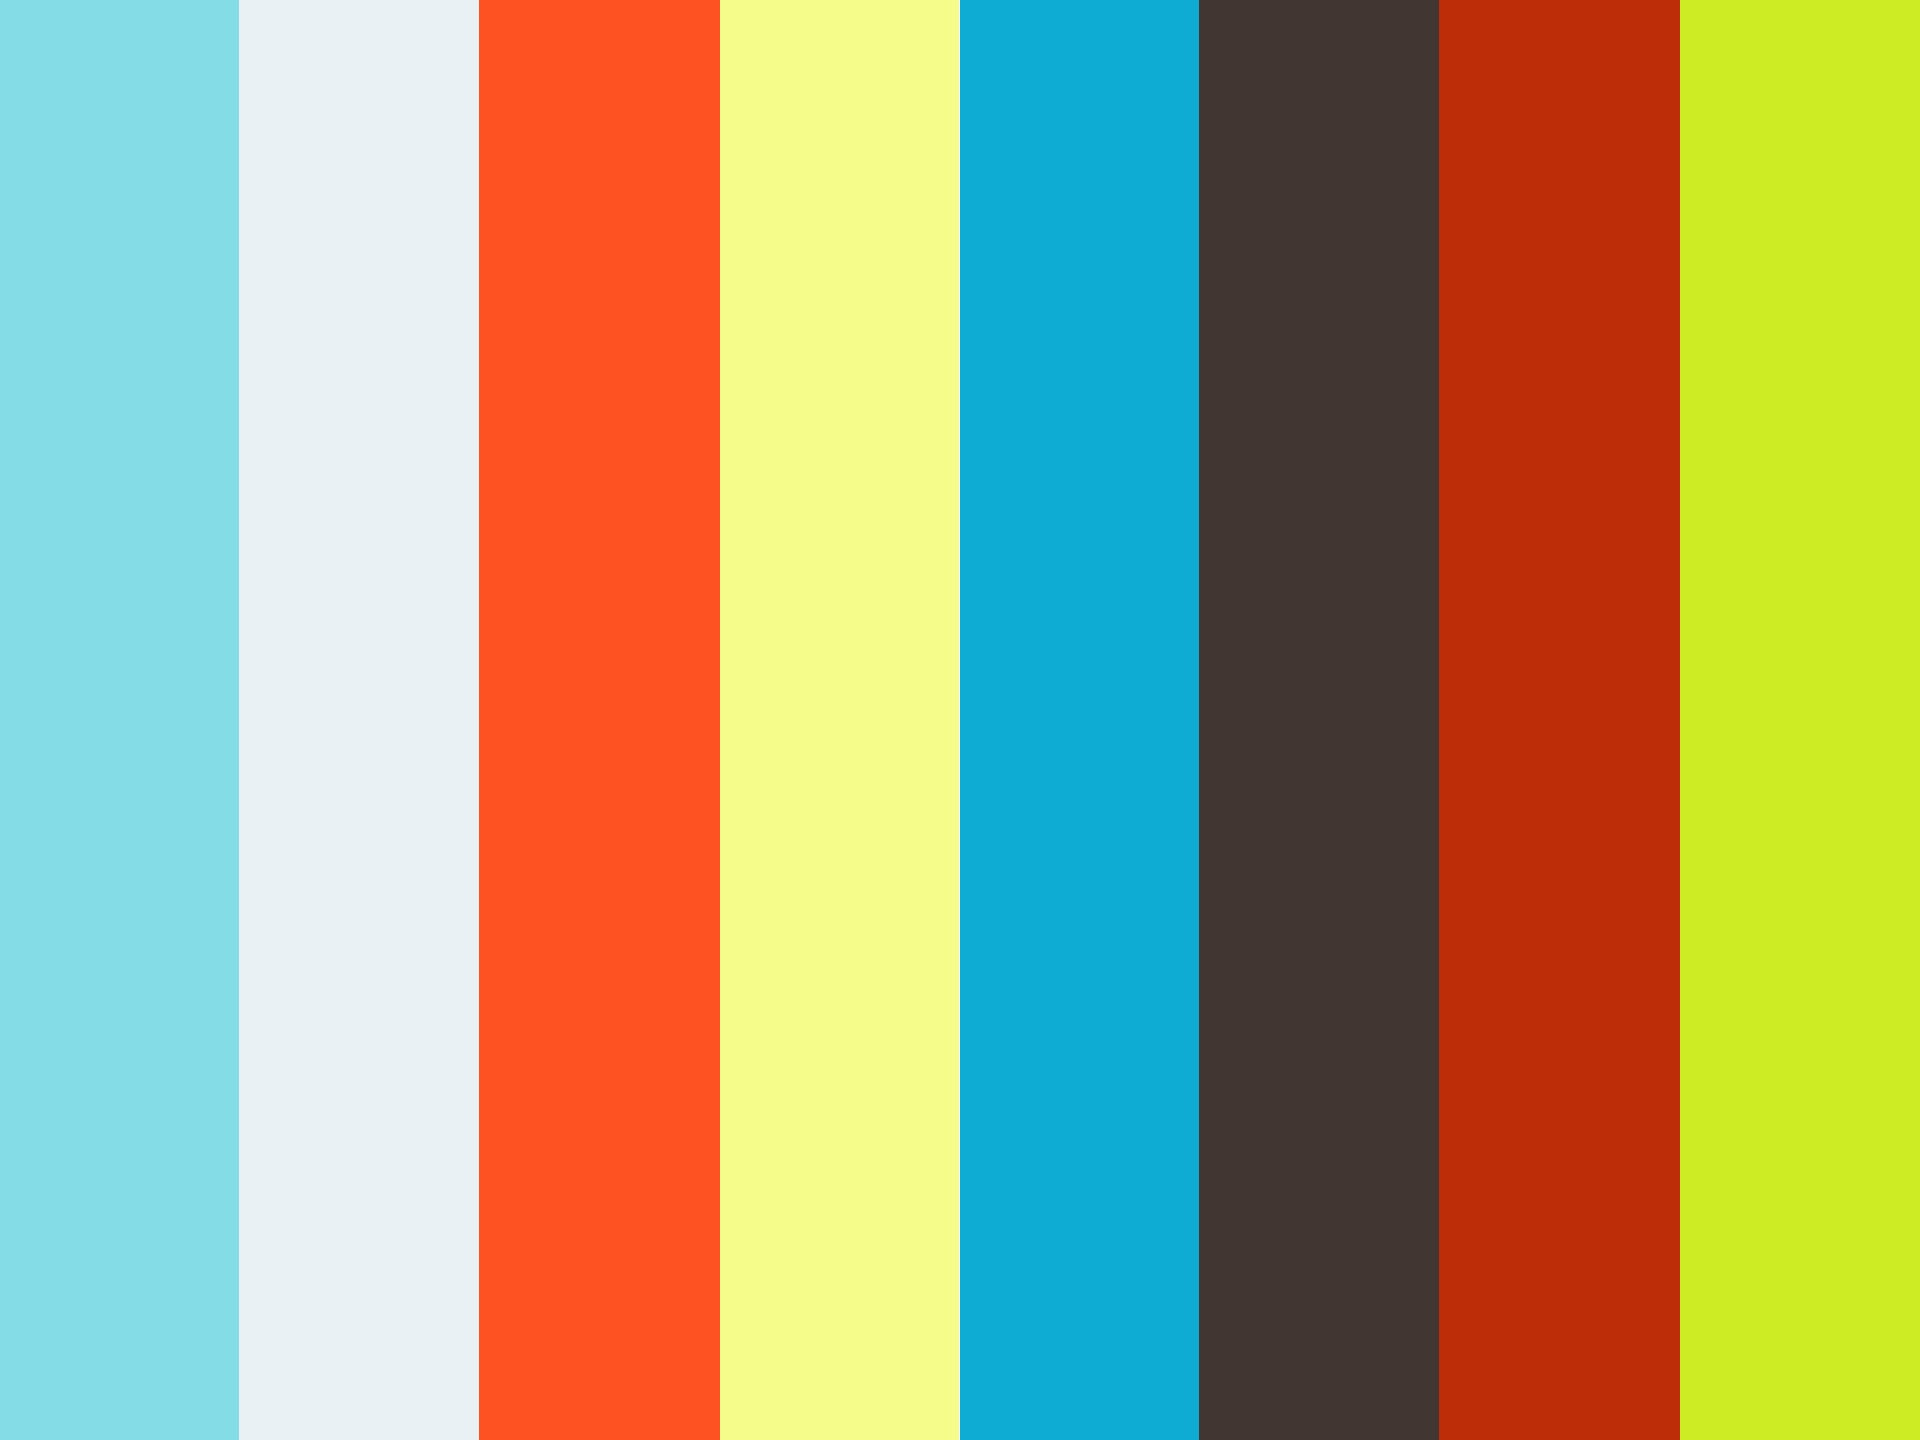 【8/4ライブ配信】DNA特別講演会 第10回記念大会【身体と口腔機能】